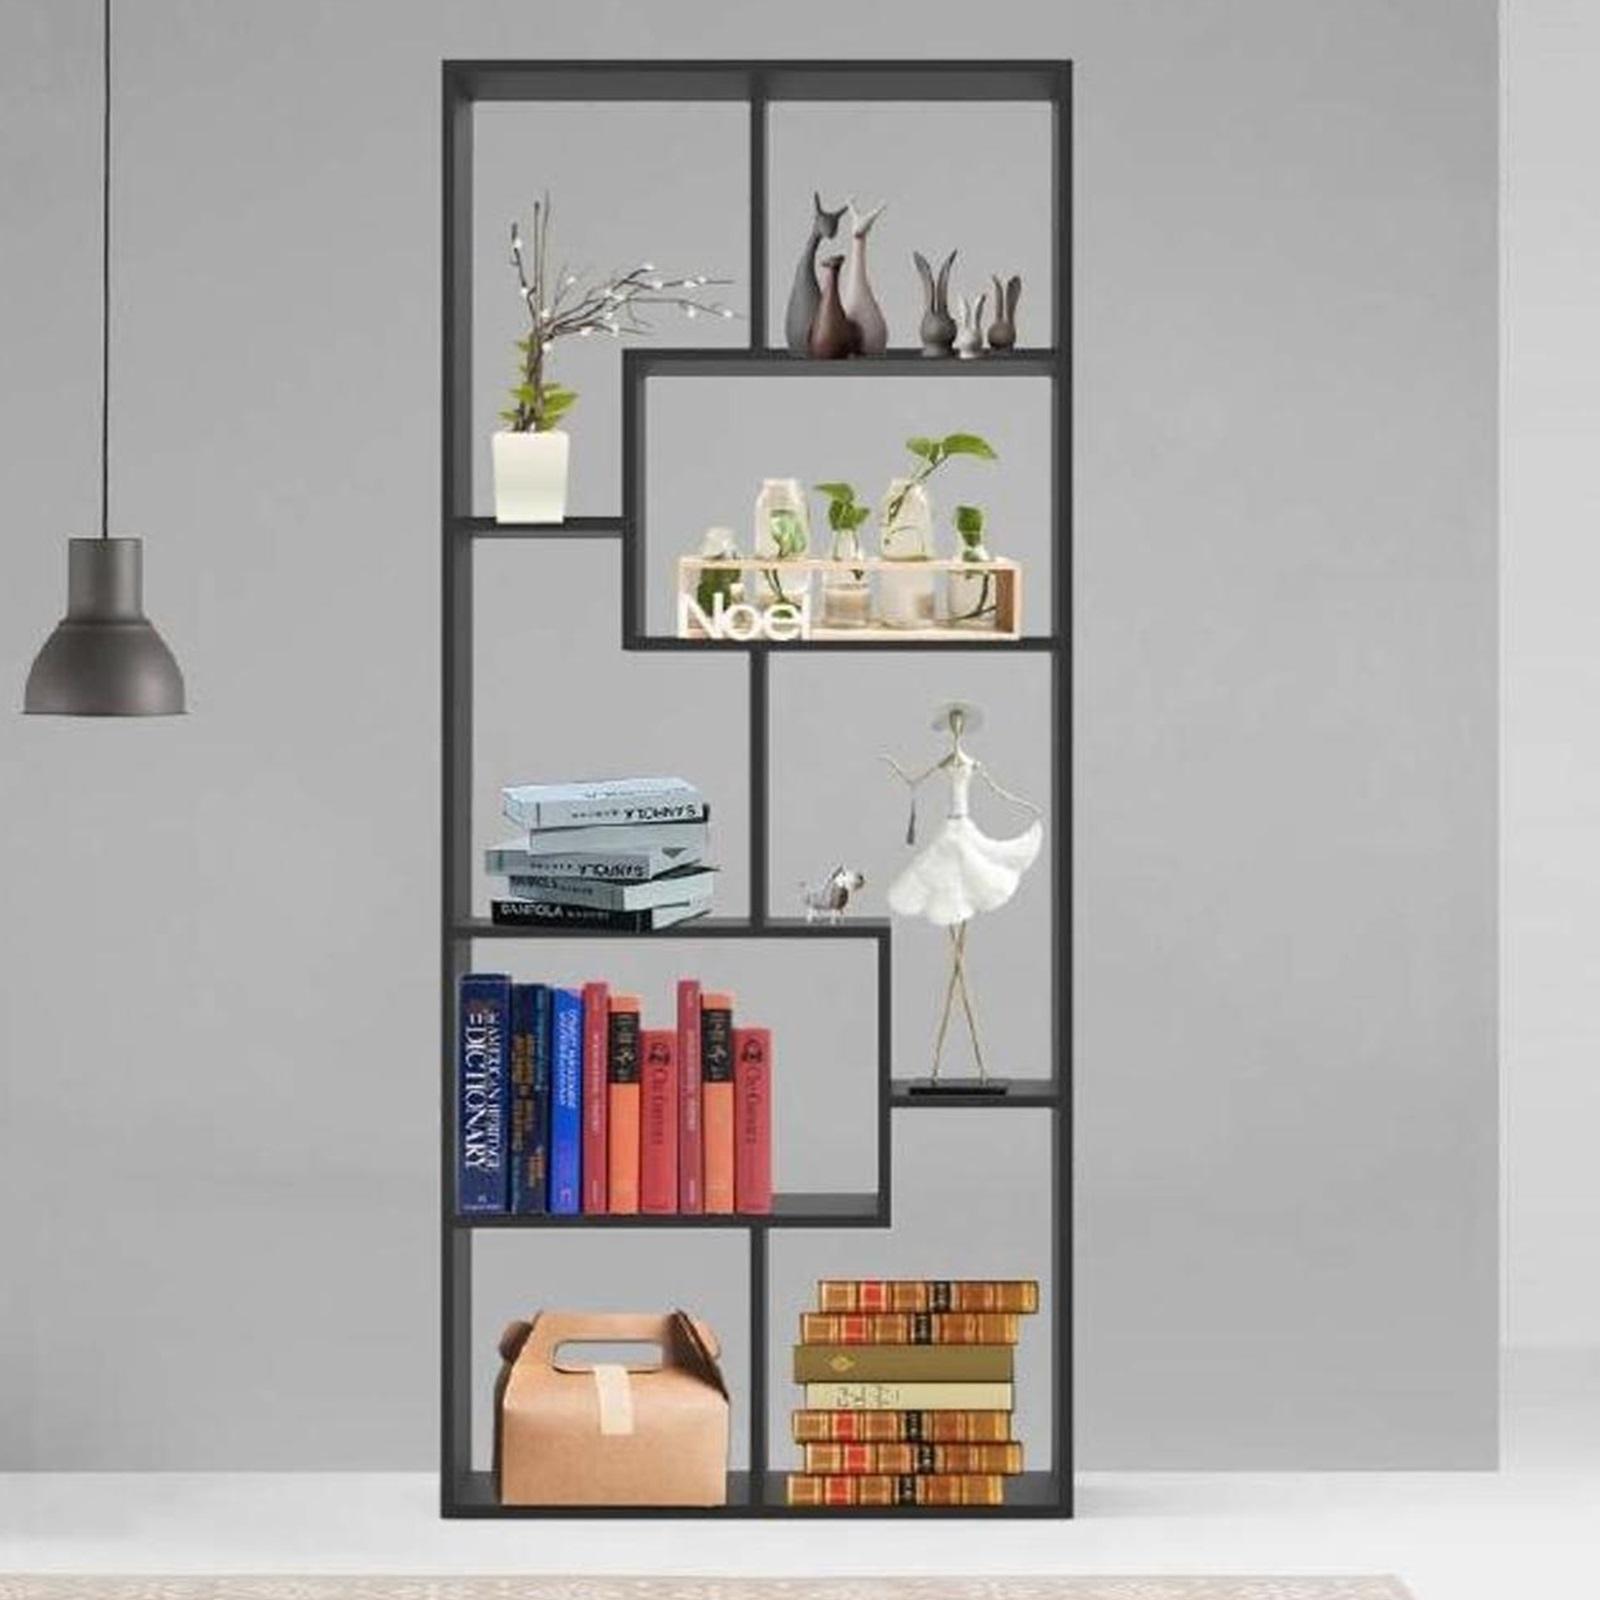 Gr8 Home Wooden Modern Open Shelving Unit Tall Bookcase Black Room Divider Storage Rack Display Organiser